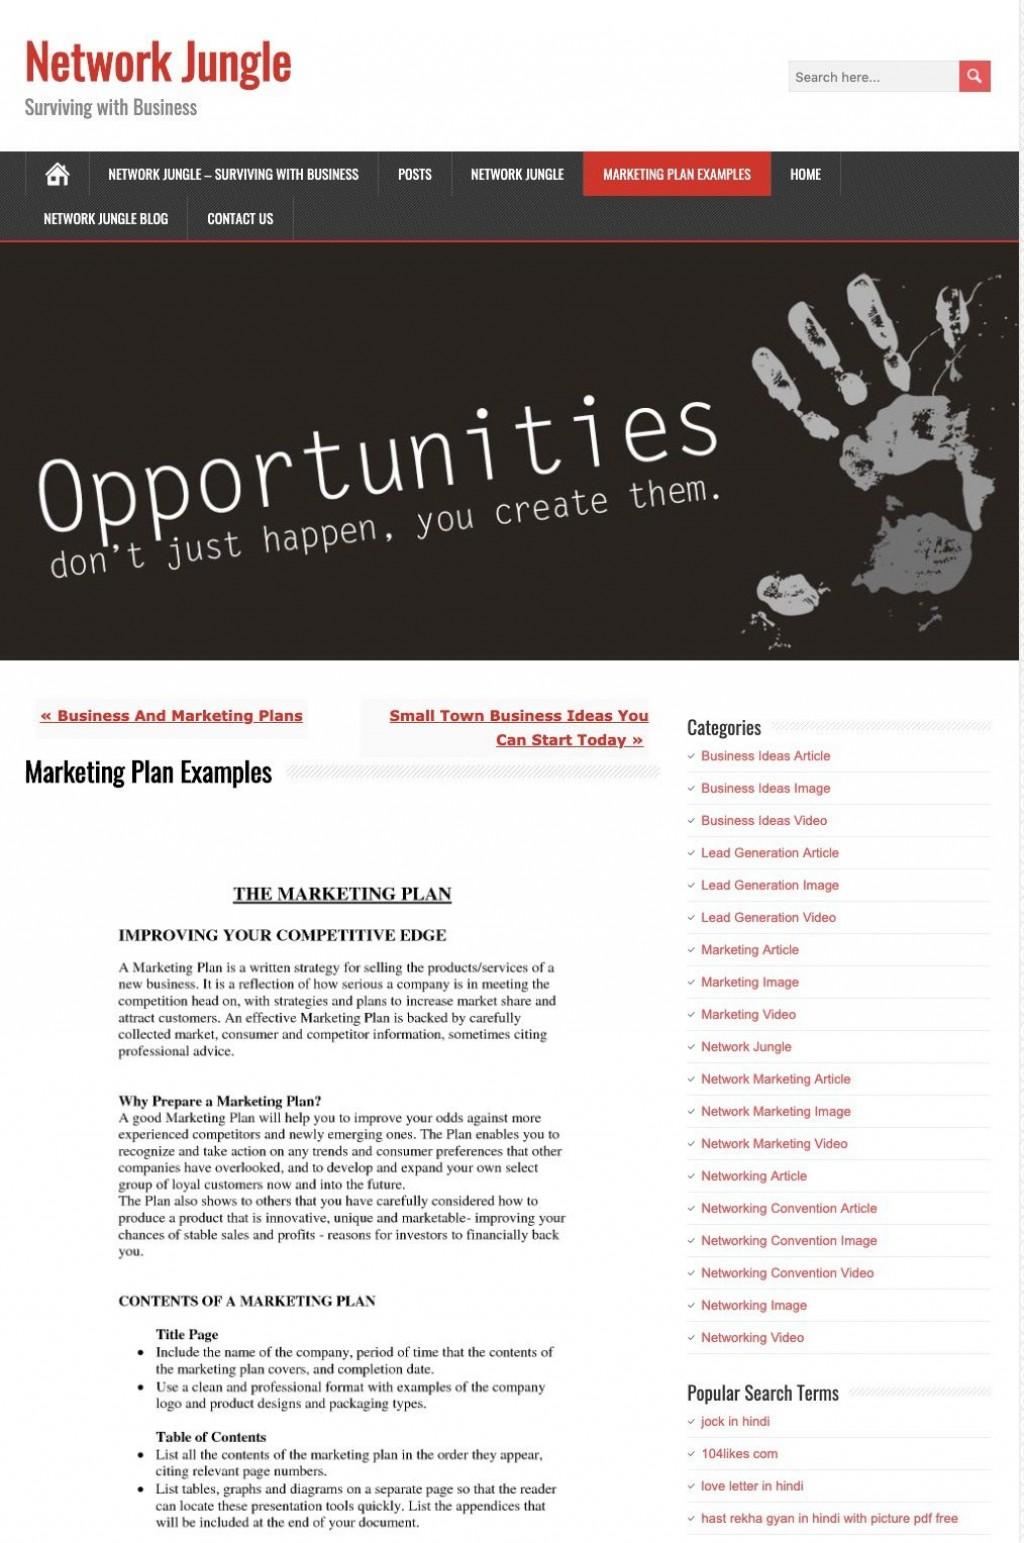 009 Best Digital Marketing Plan Template Download Highest Clarity Large